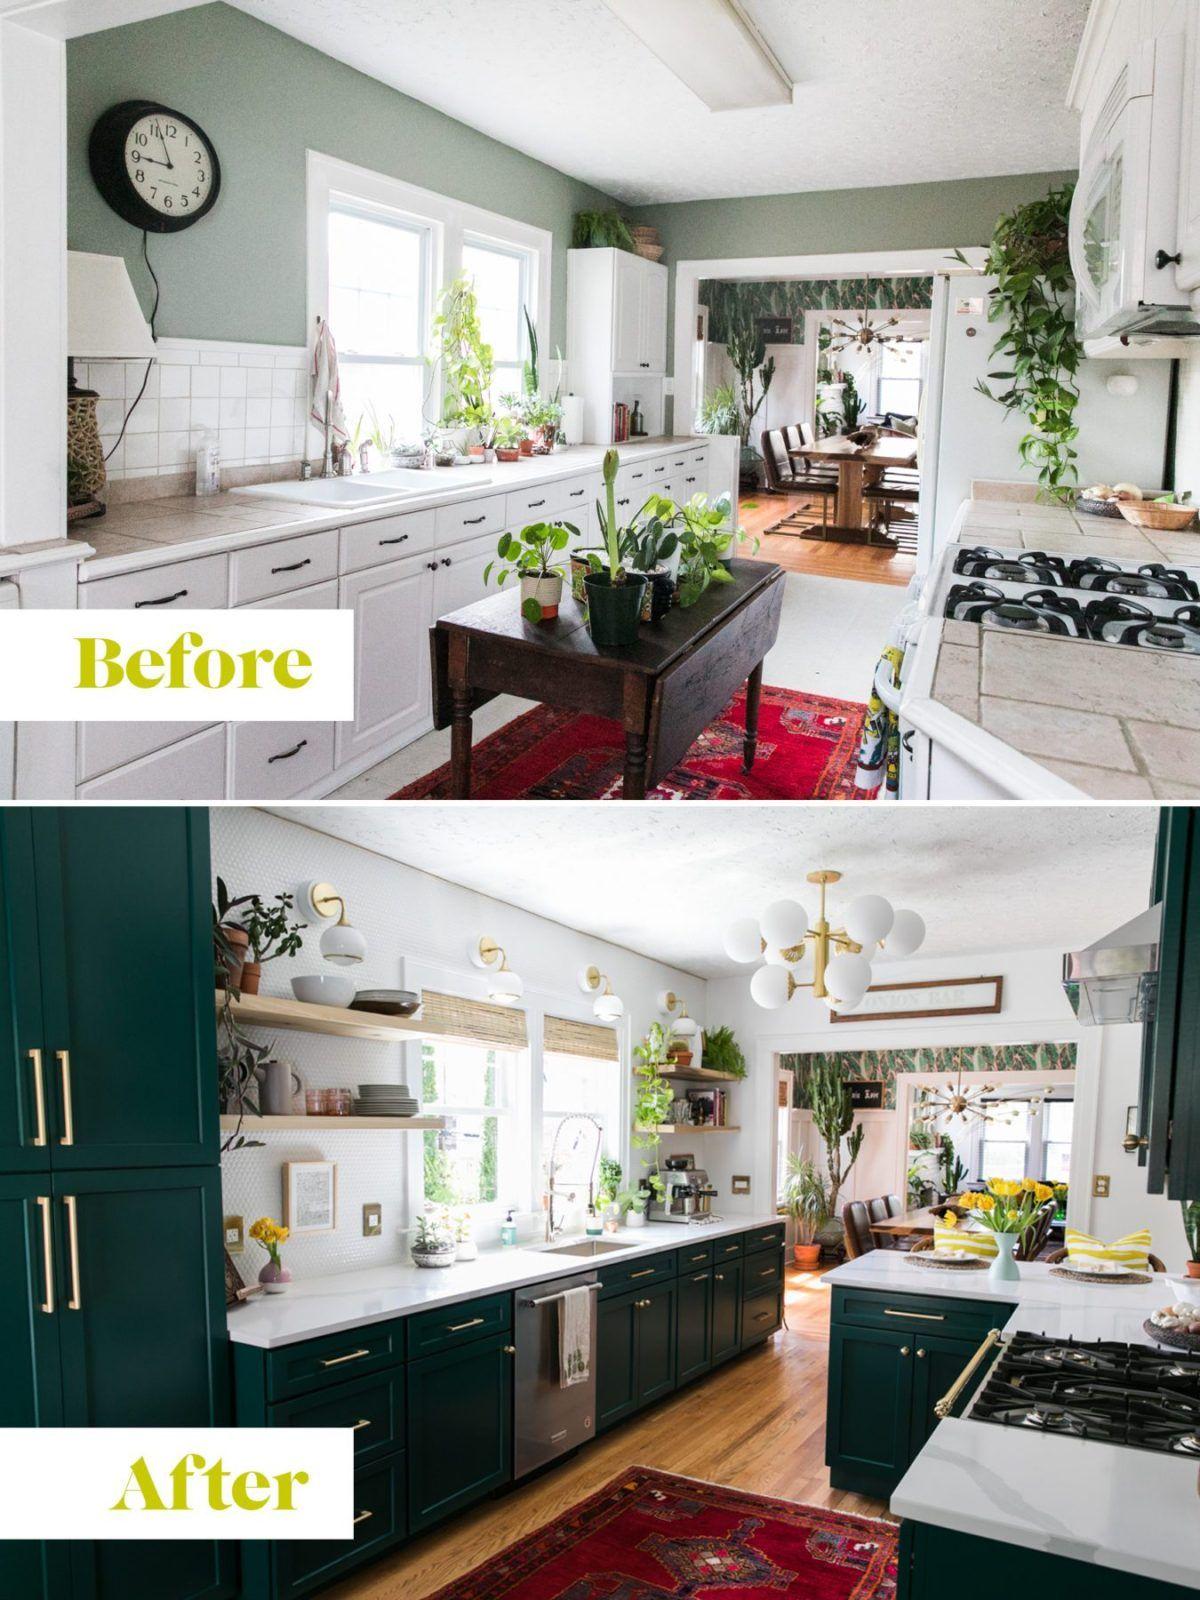 One Room Challenge - Green Kitchen Glamazon - The Reveal » Jessica Brigham